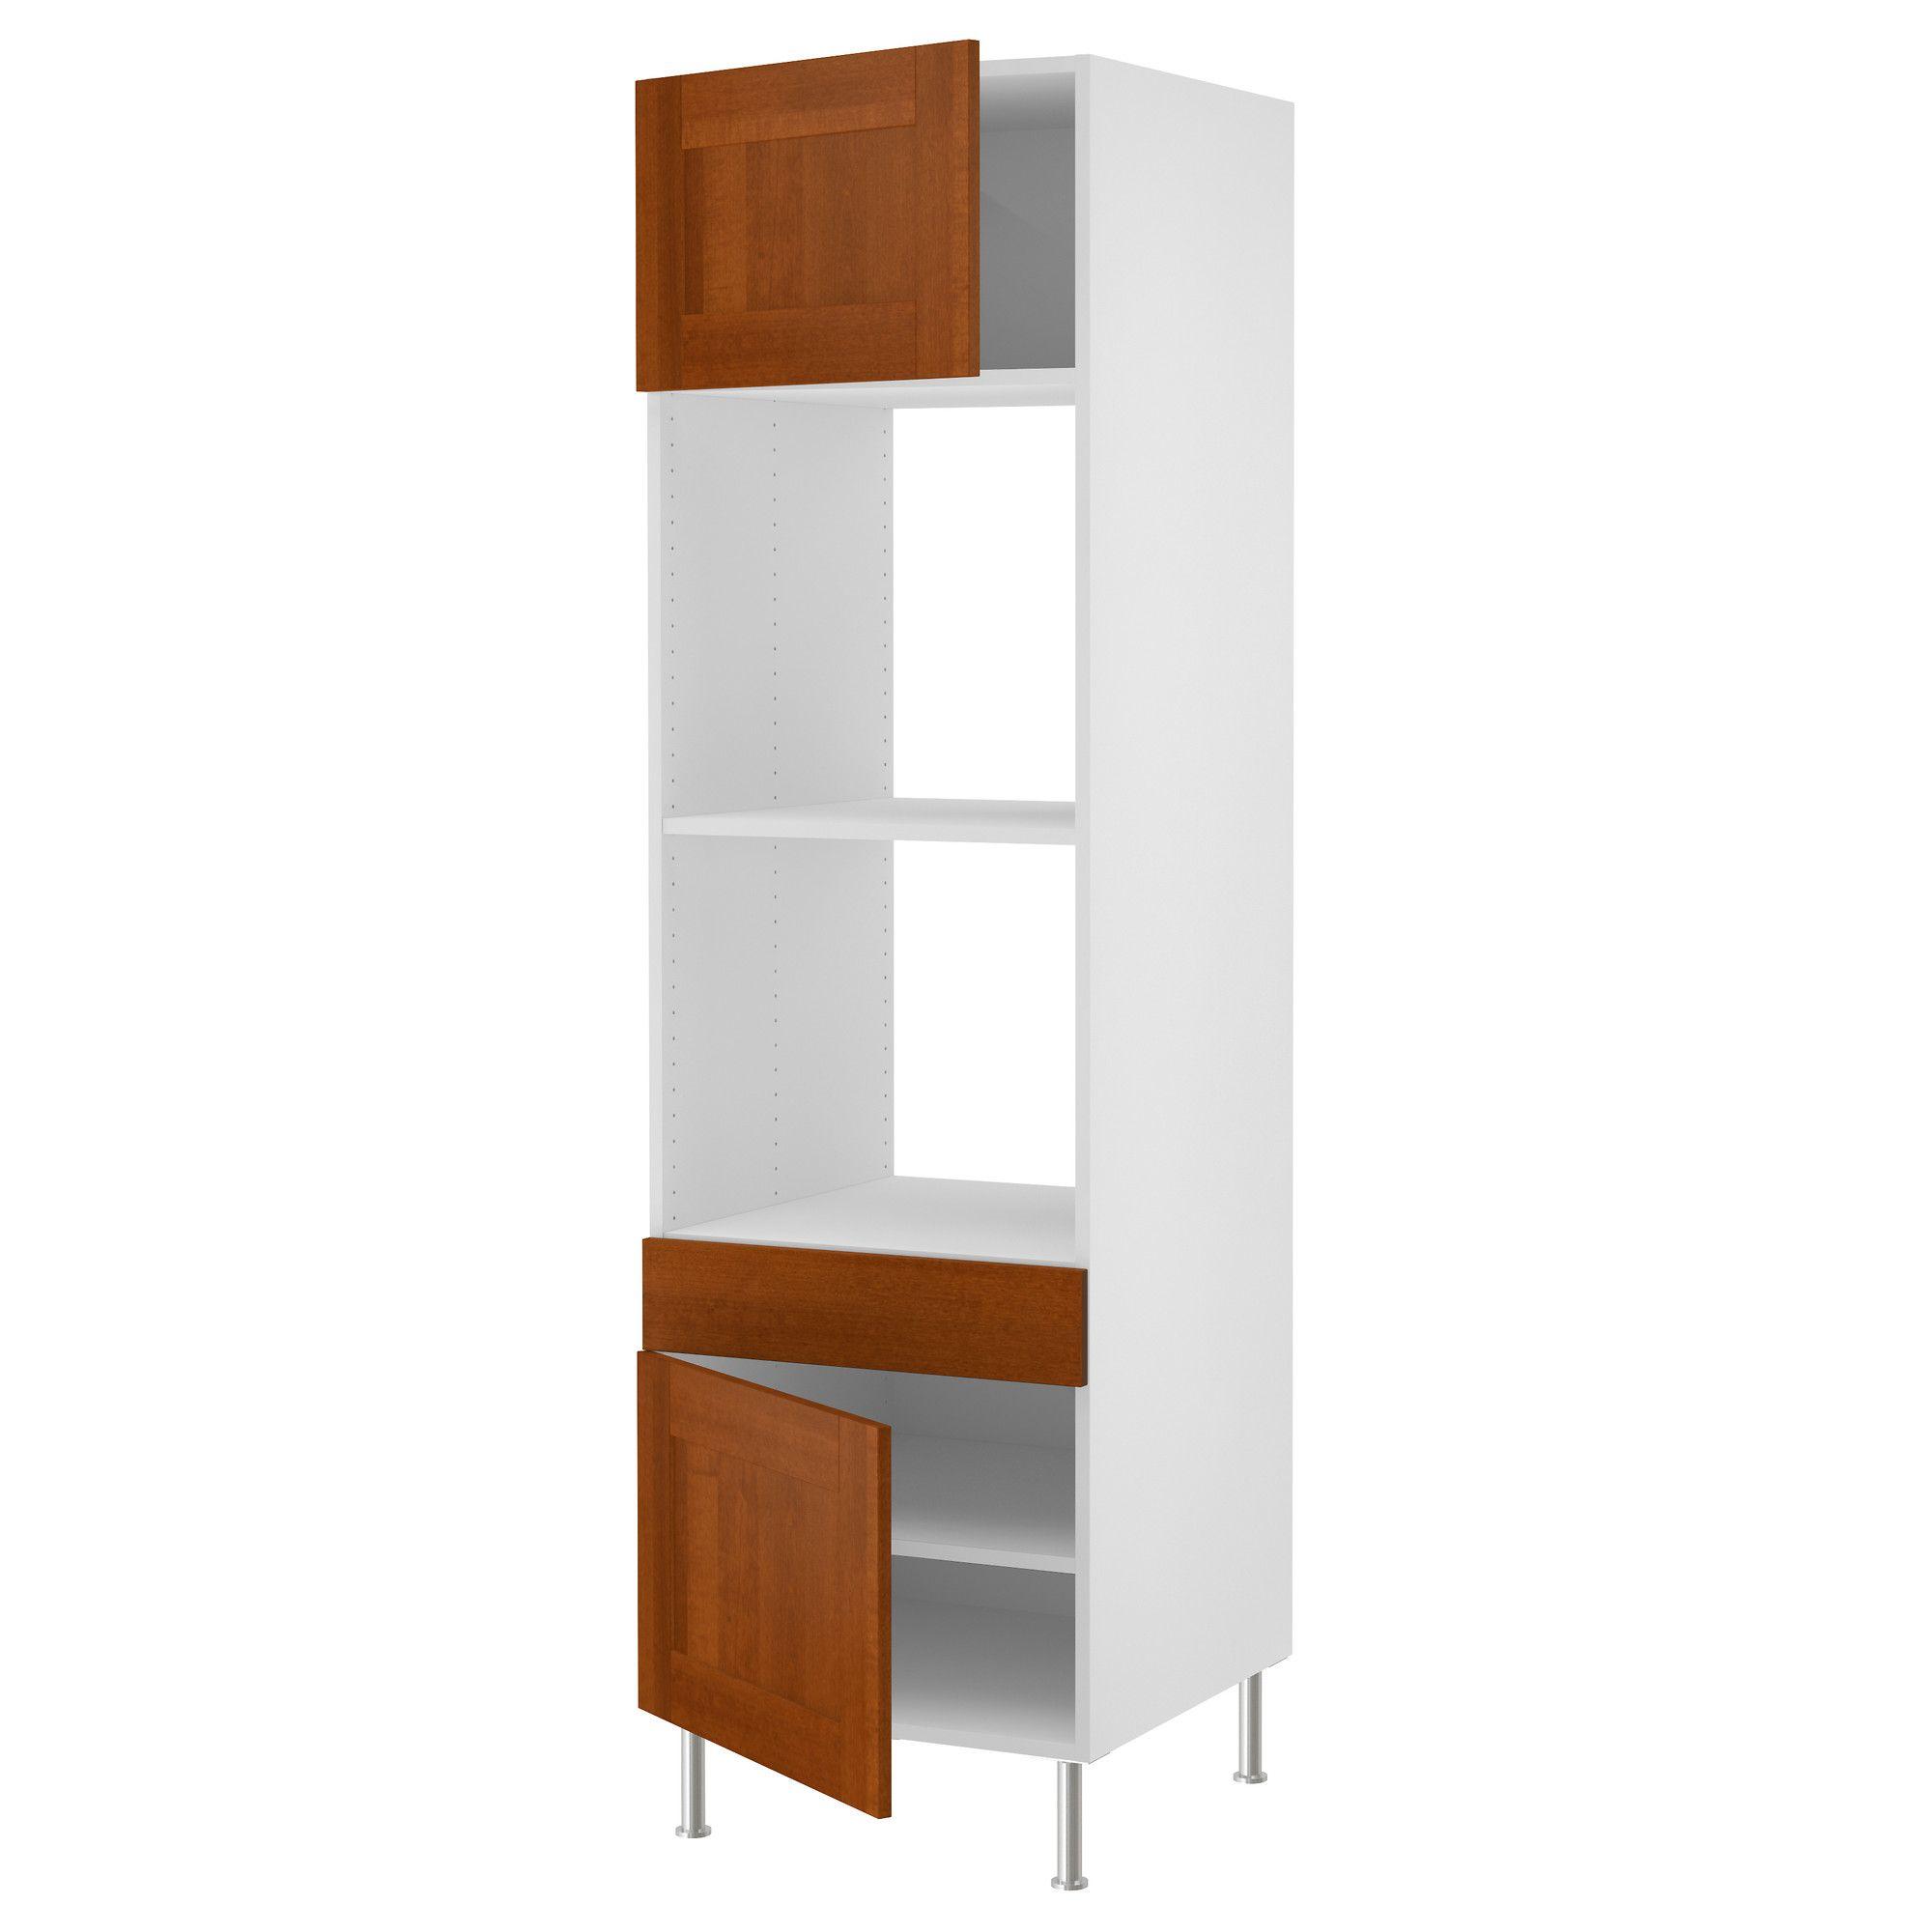 AKURUM High cabinet f built-in oven/micro - birch effect Ädel medium  sc 1 st  Pinterest & AKURUM High cabinet f built-in oven/micro - birch effect Ädel ...